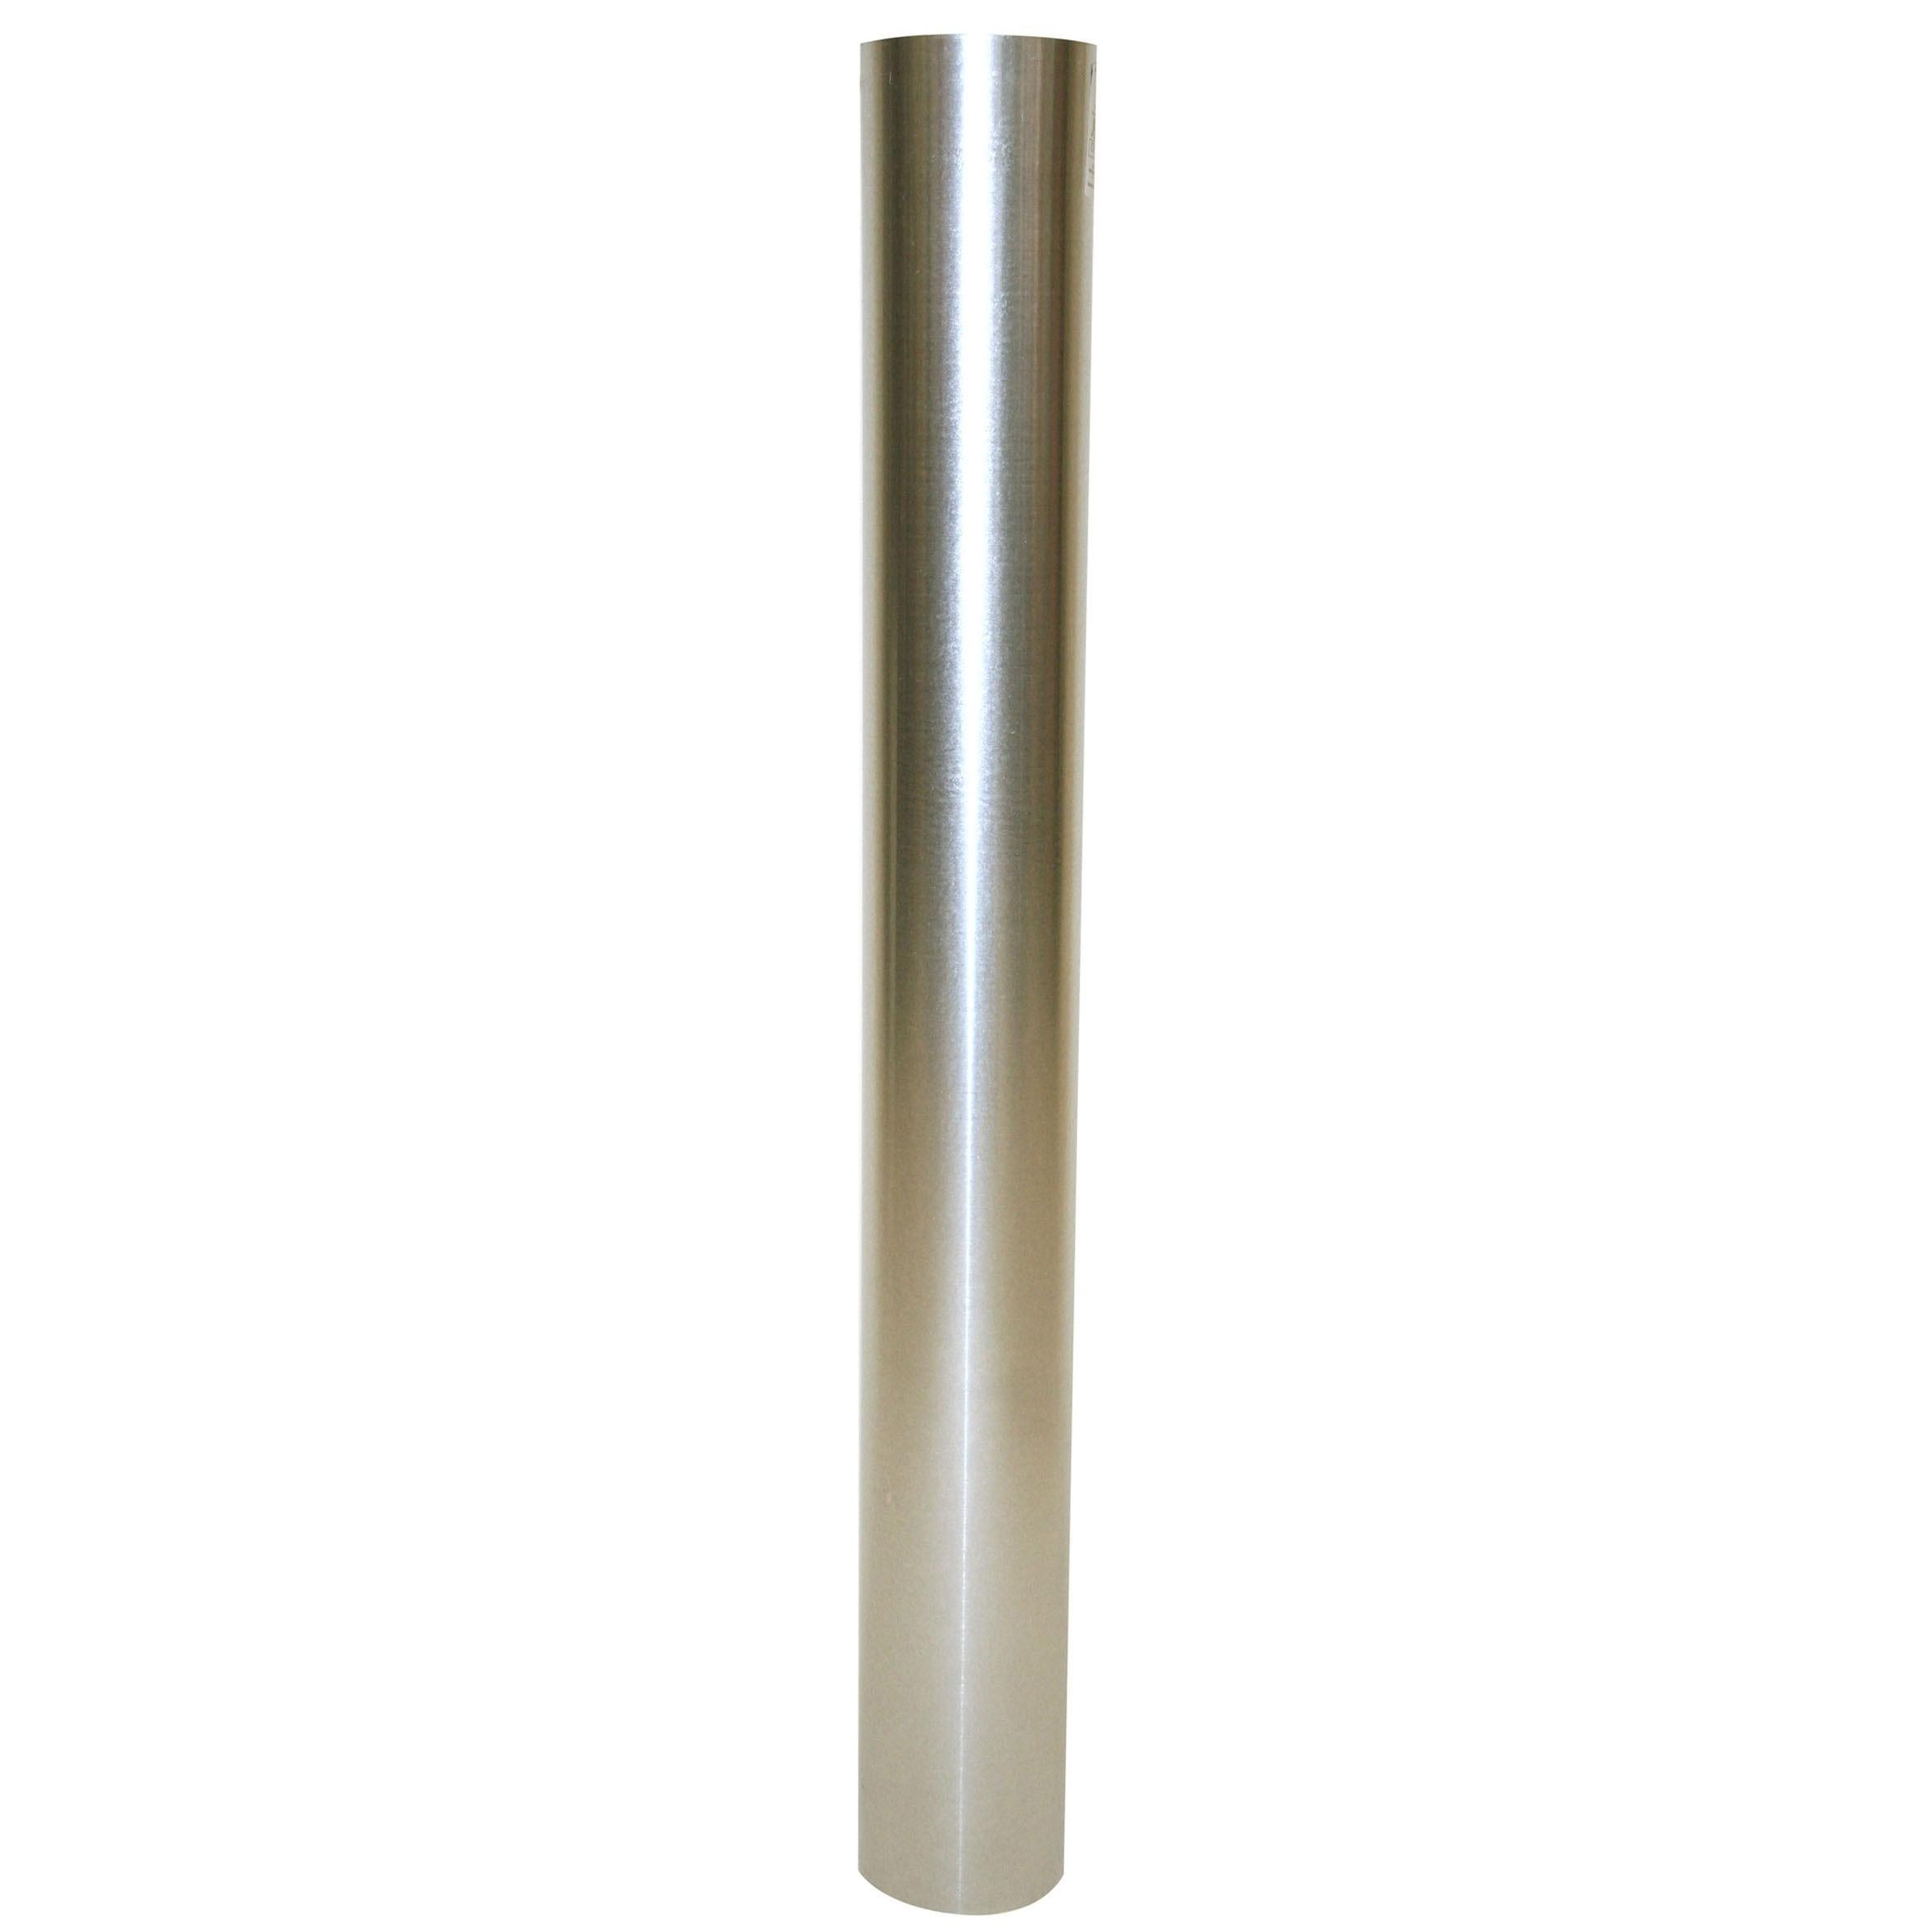 Ofenrohr / Rauchrohr KaminoFlam FAL Ø 120 mm Länge 1000 mm Bild 1